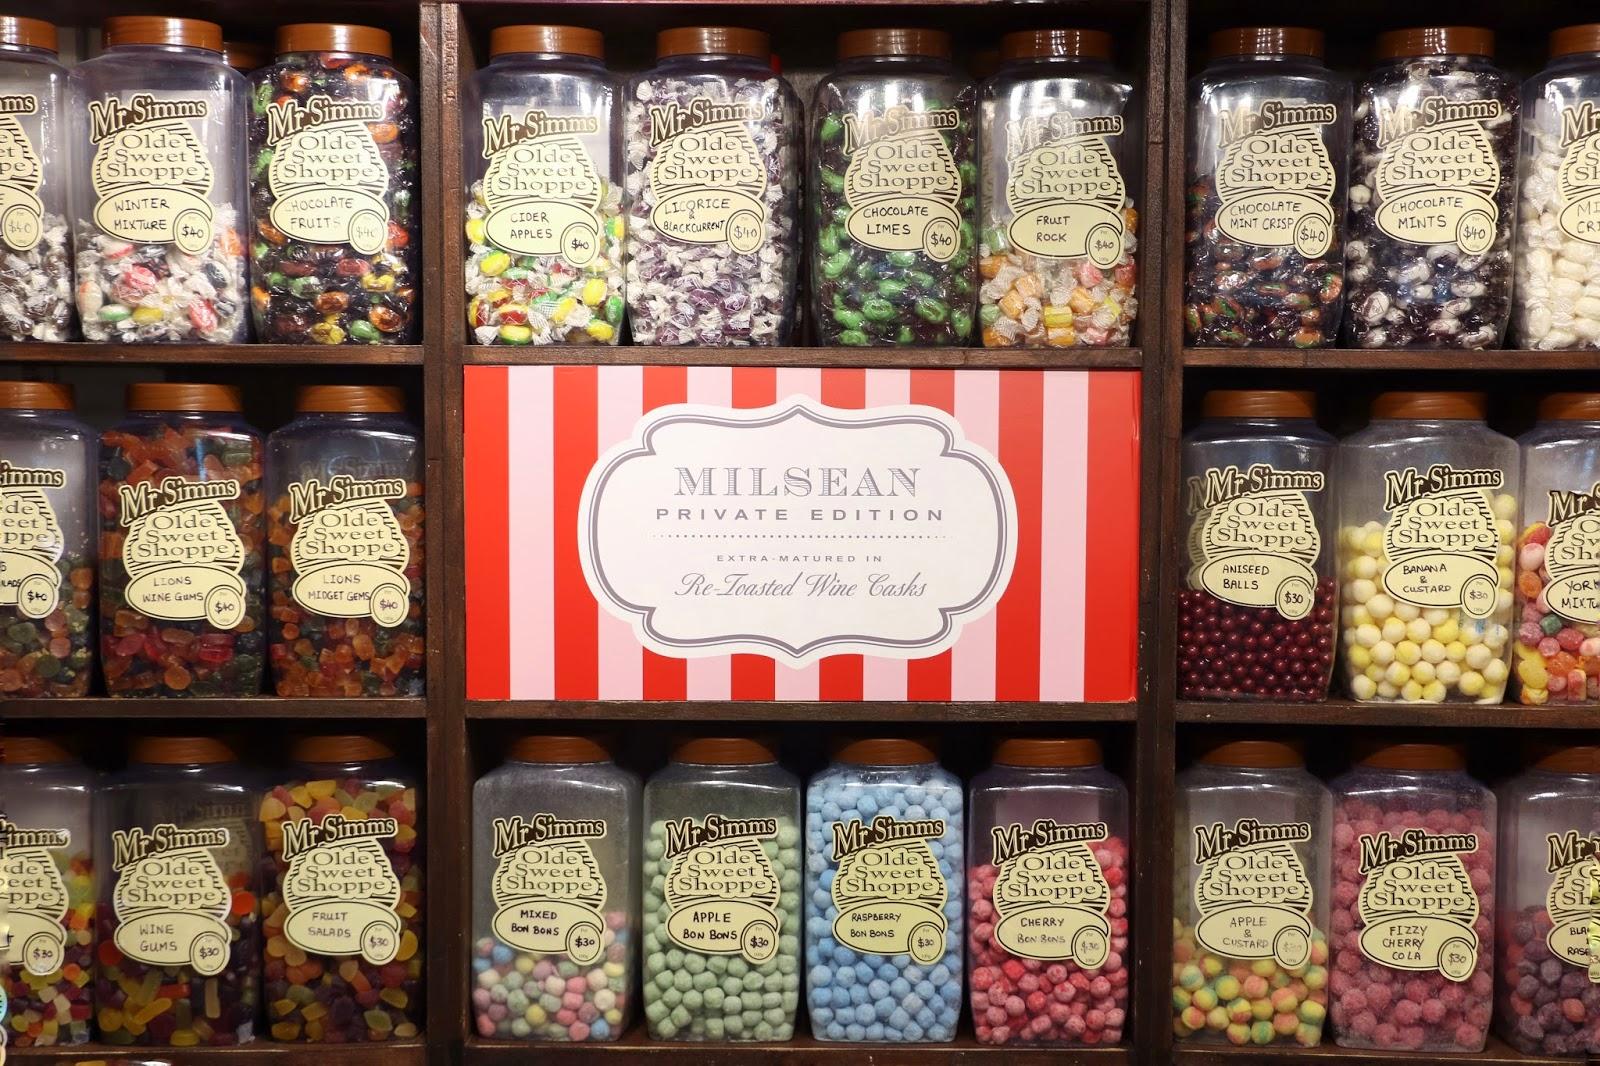 Glenmorangie Milsean, Mr Simms Olde Sweet Shoppe